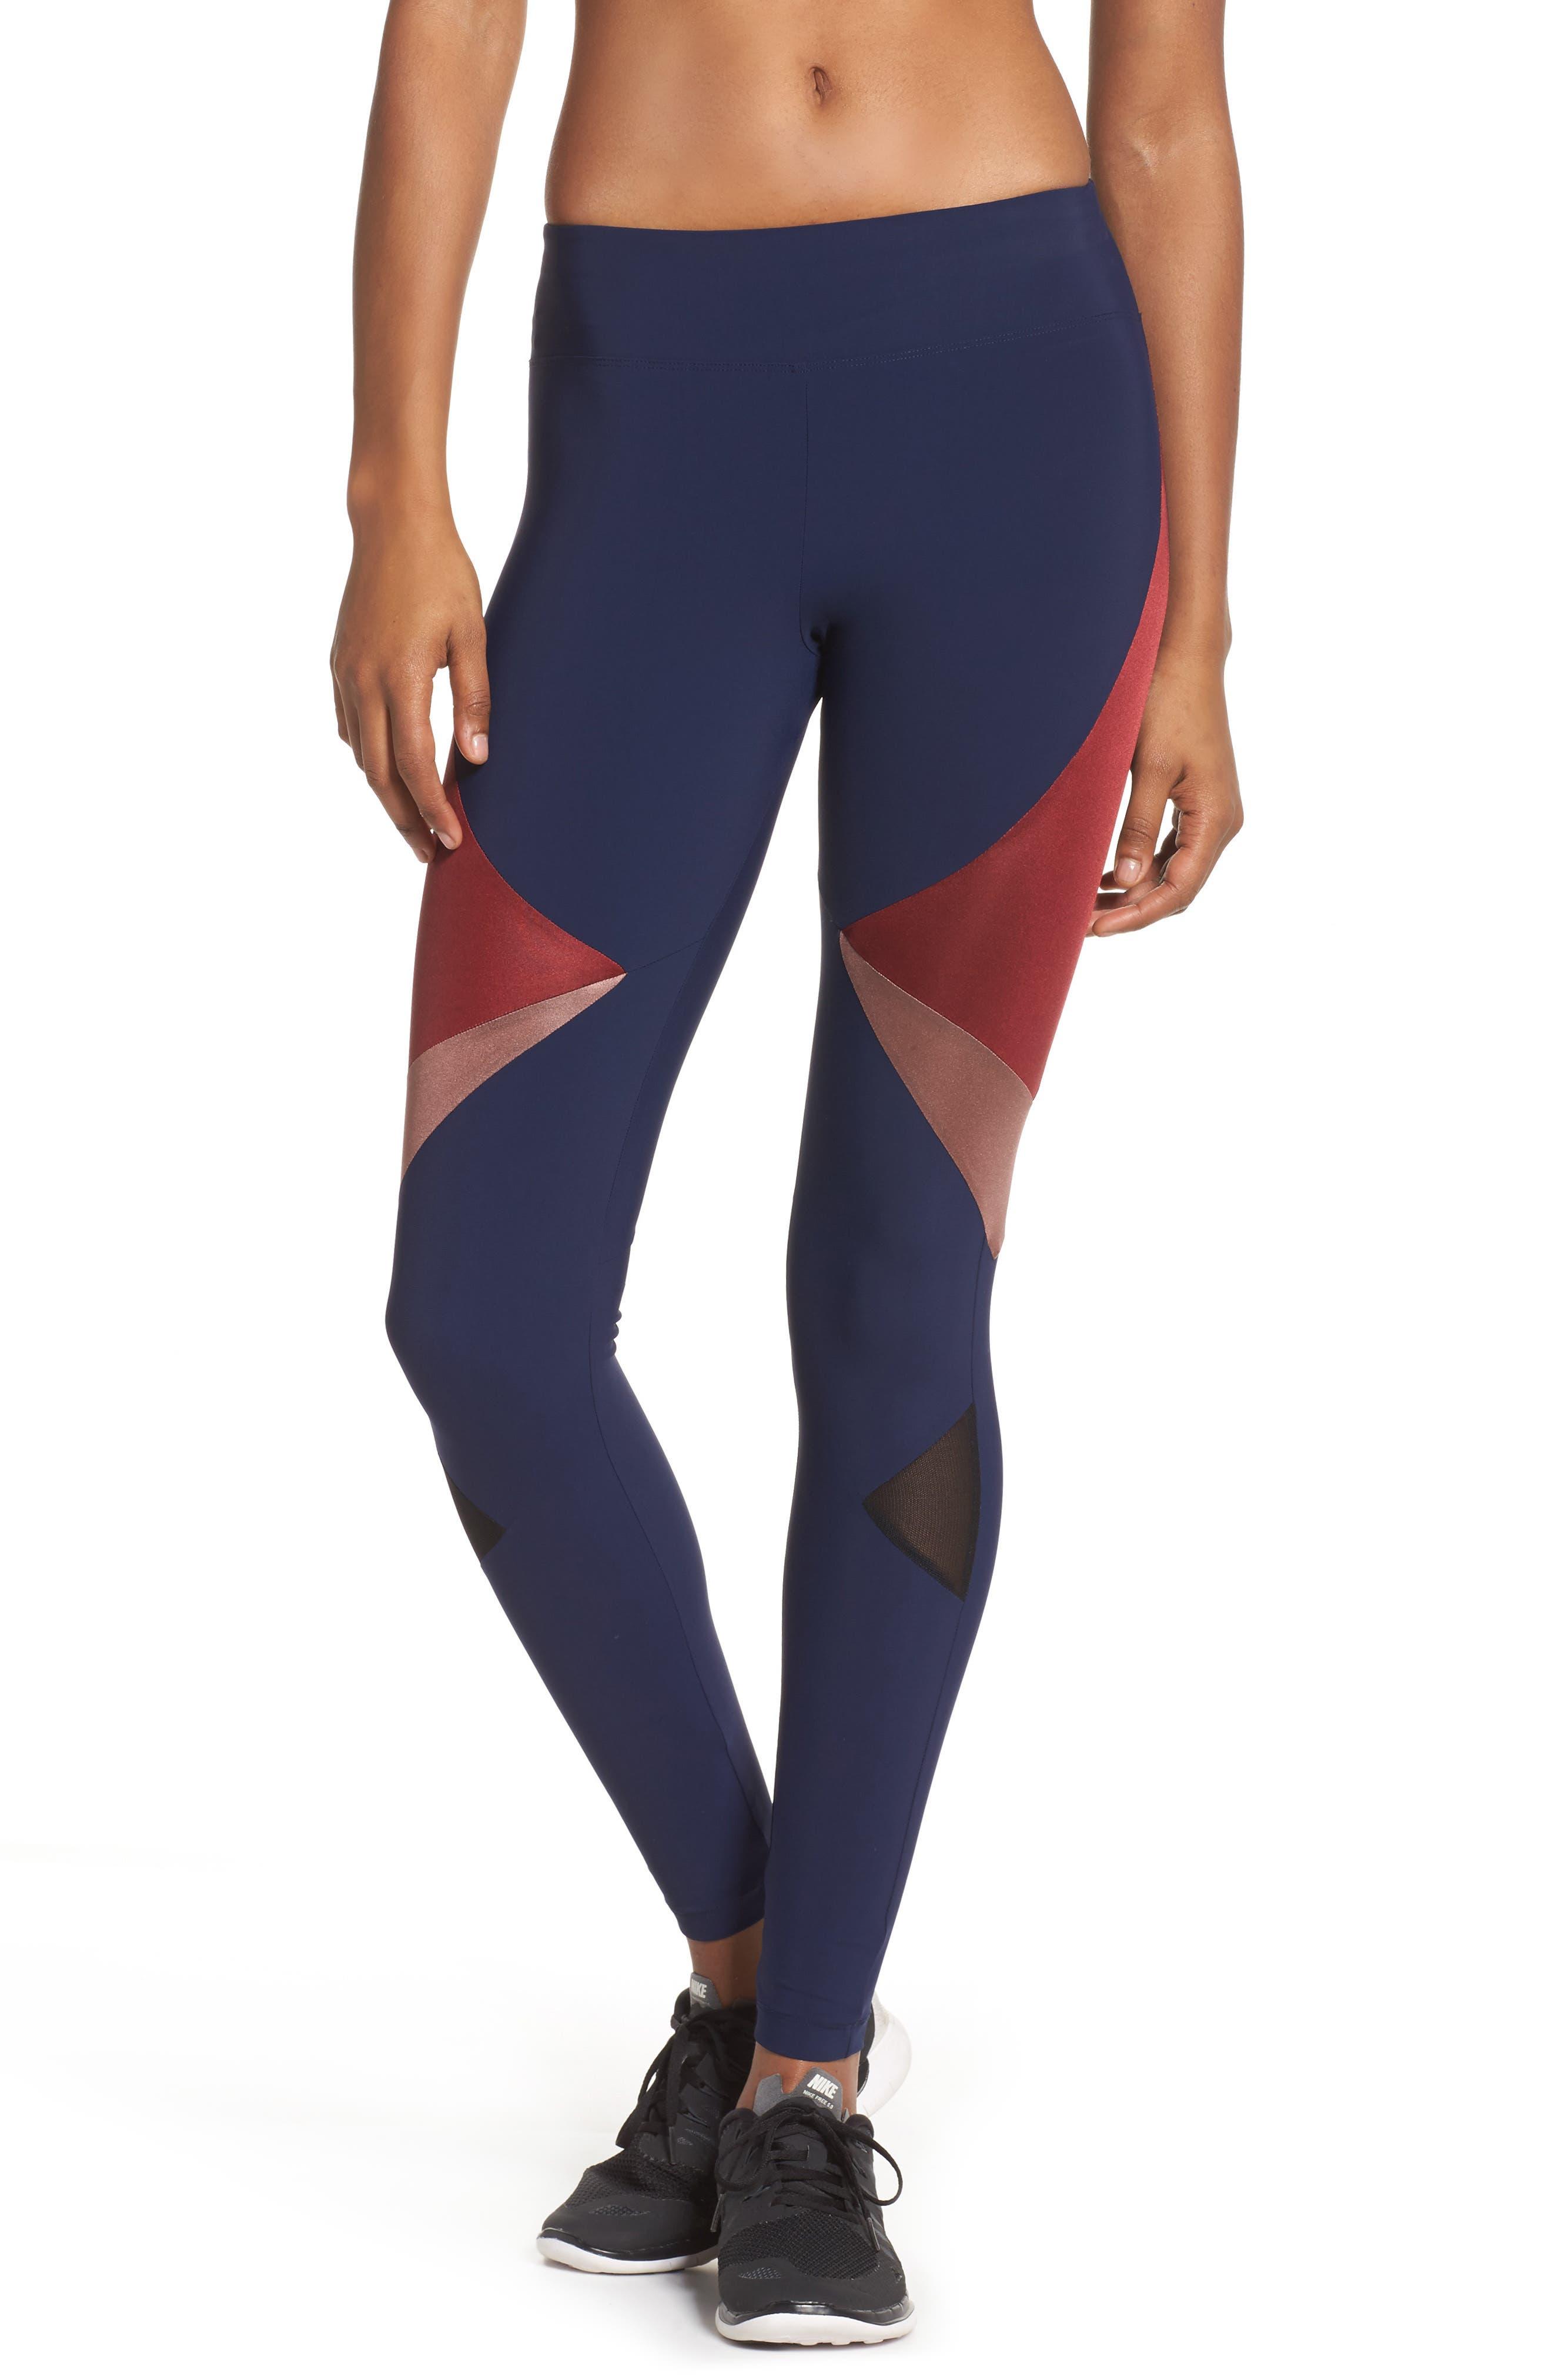 BoomBoom Athletica Compression Leggings,                         Main,                         color,